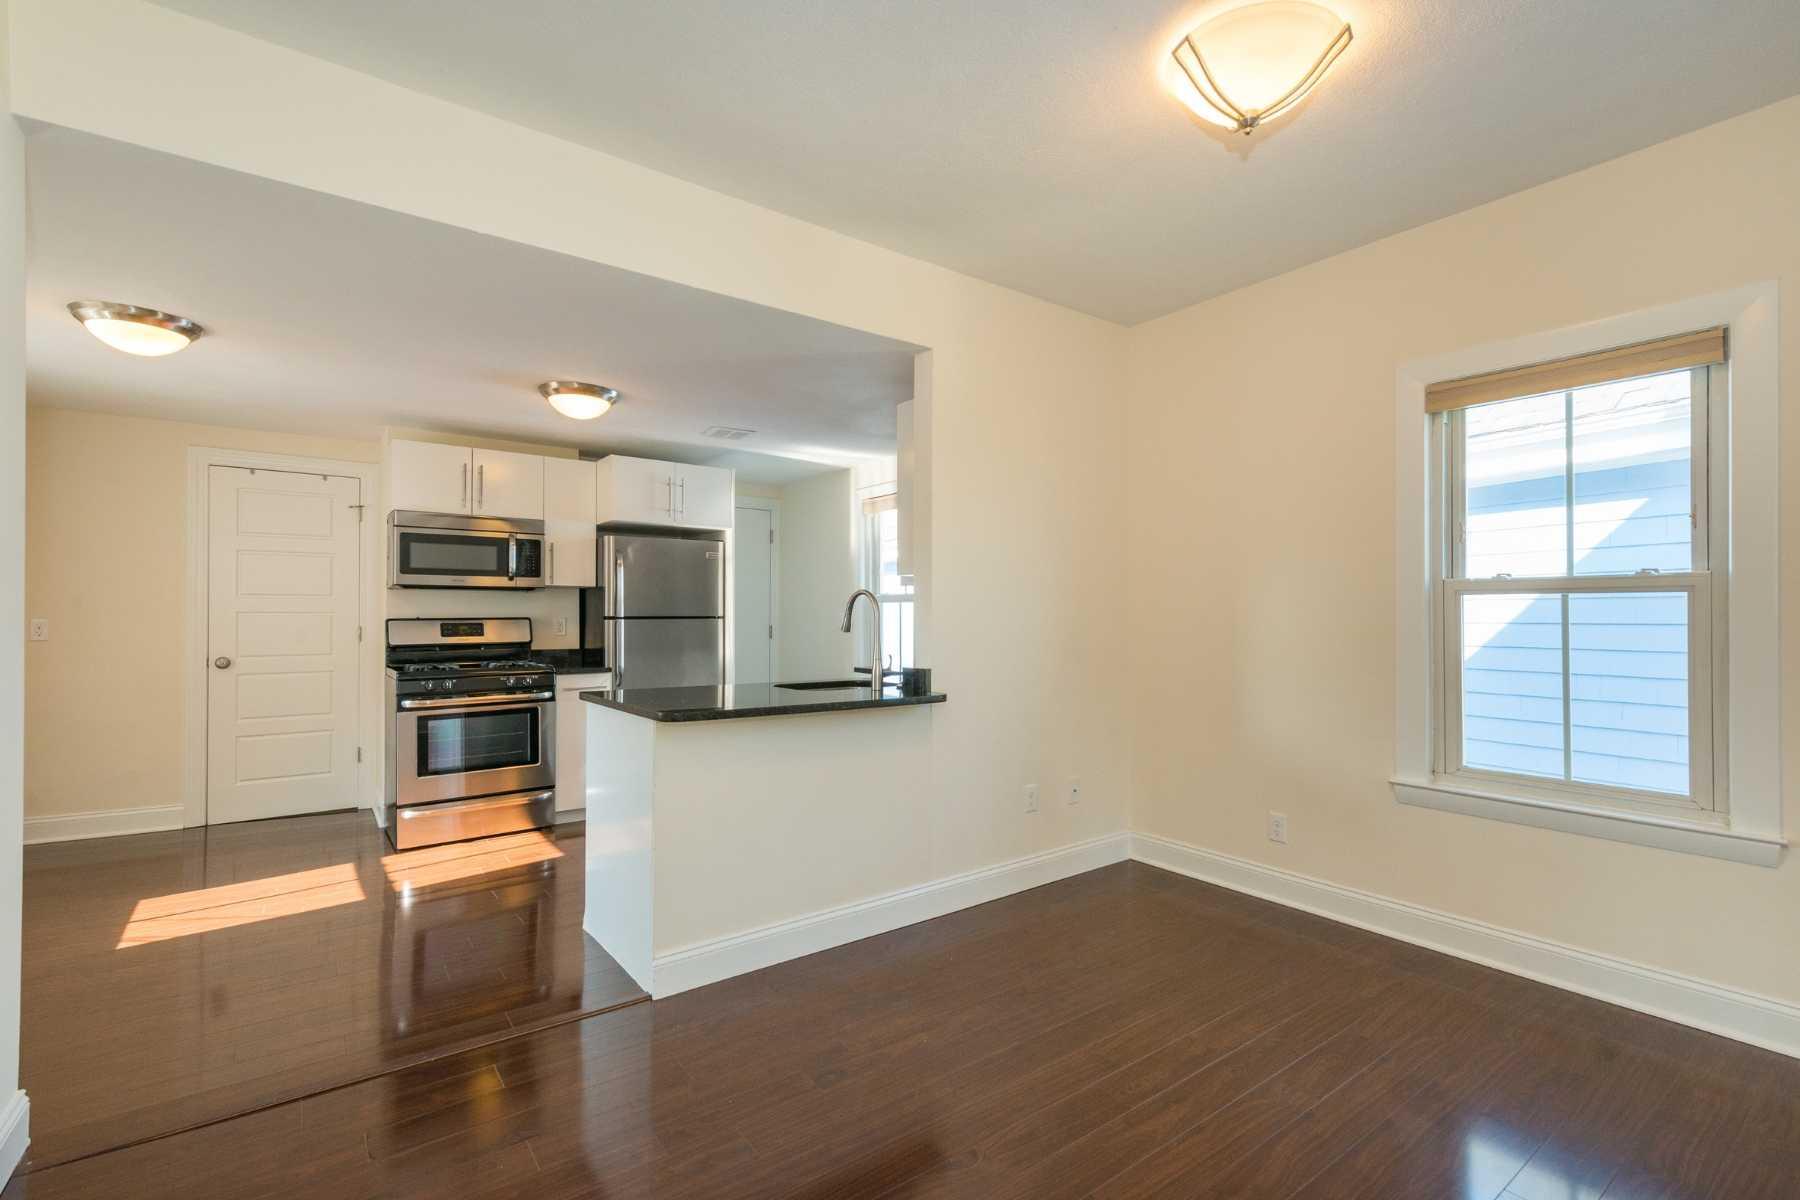 4-CapstoneCommunities-property-Dickinson-Street-Apartments-Somerville.jpg